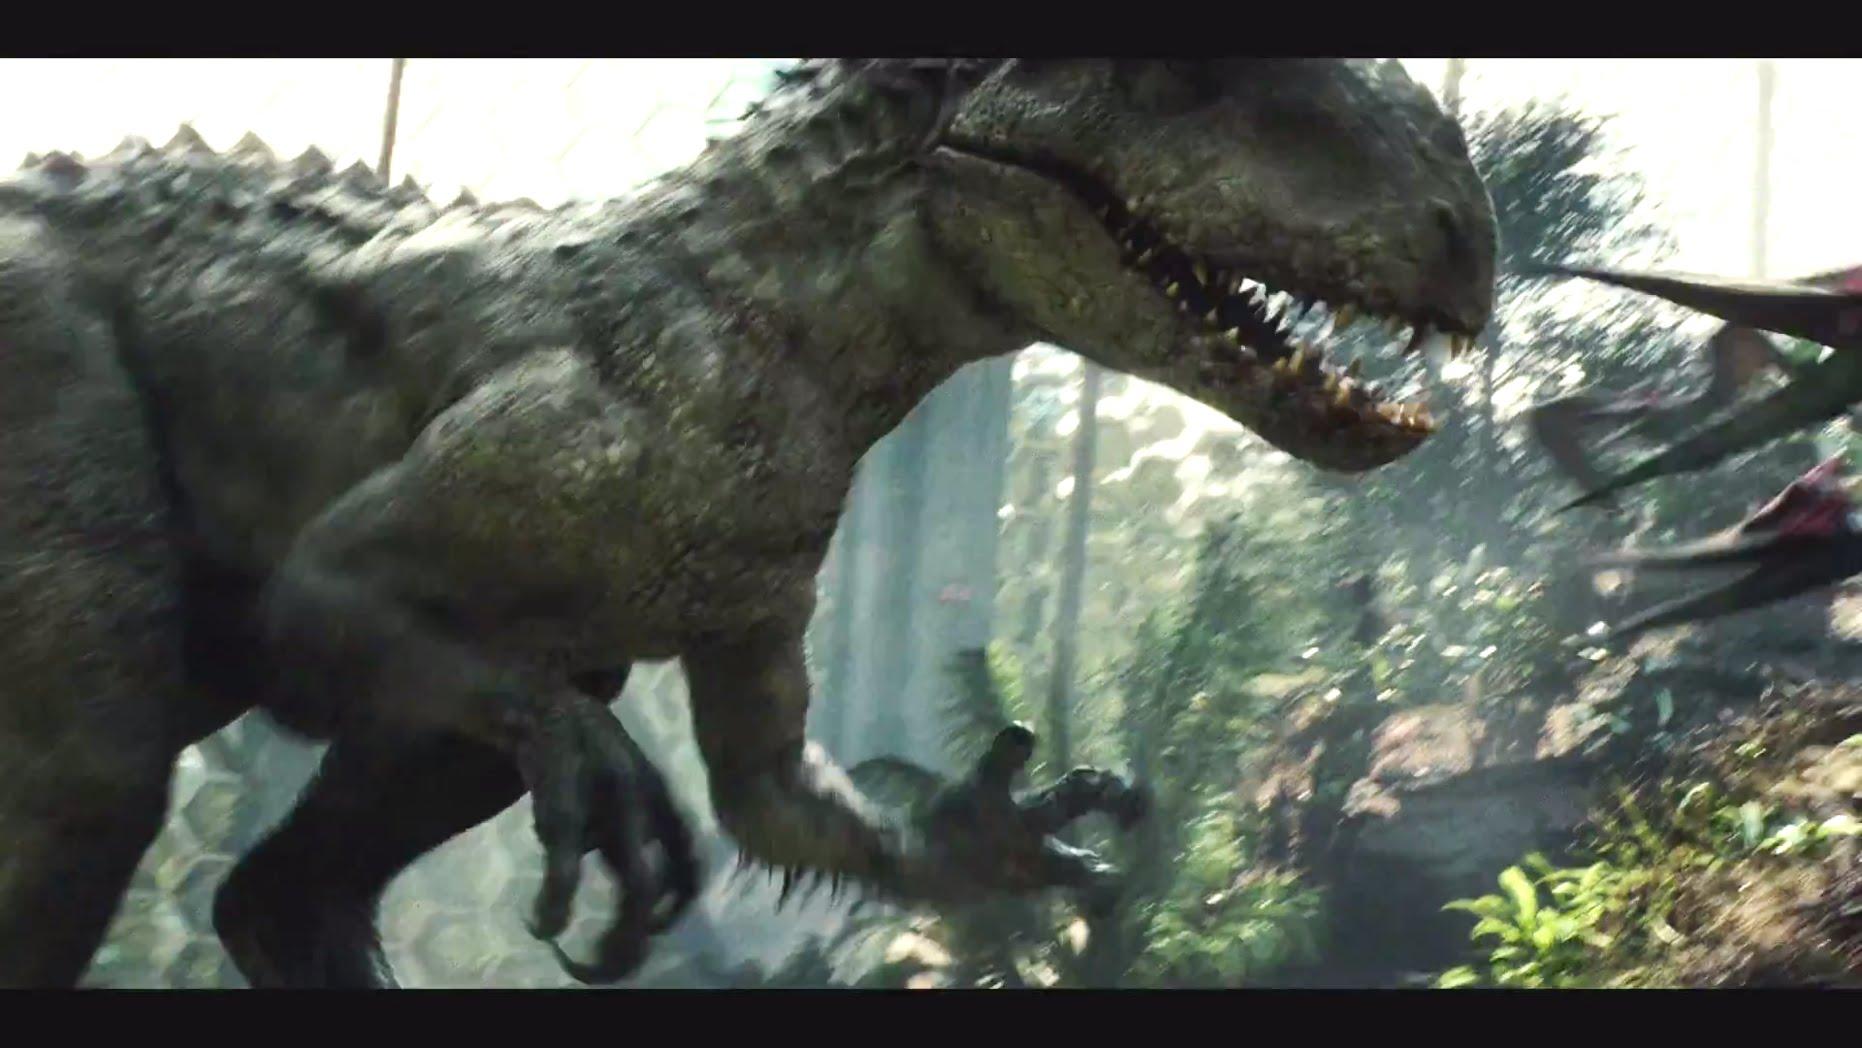 46+] Jurassic World T Rex Wallpaper on